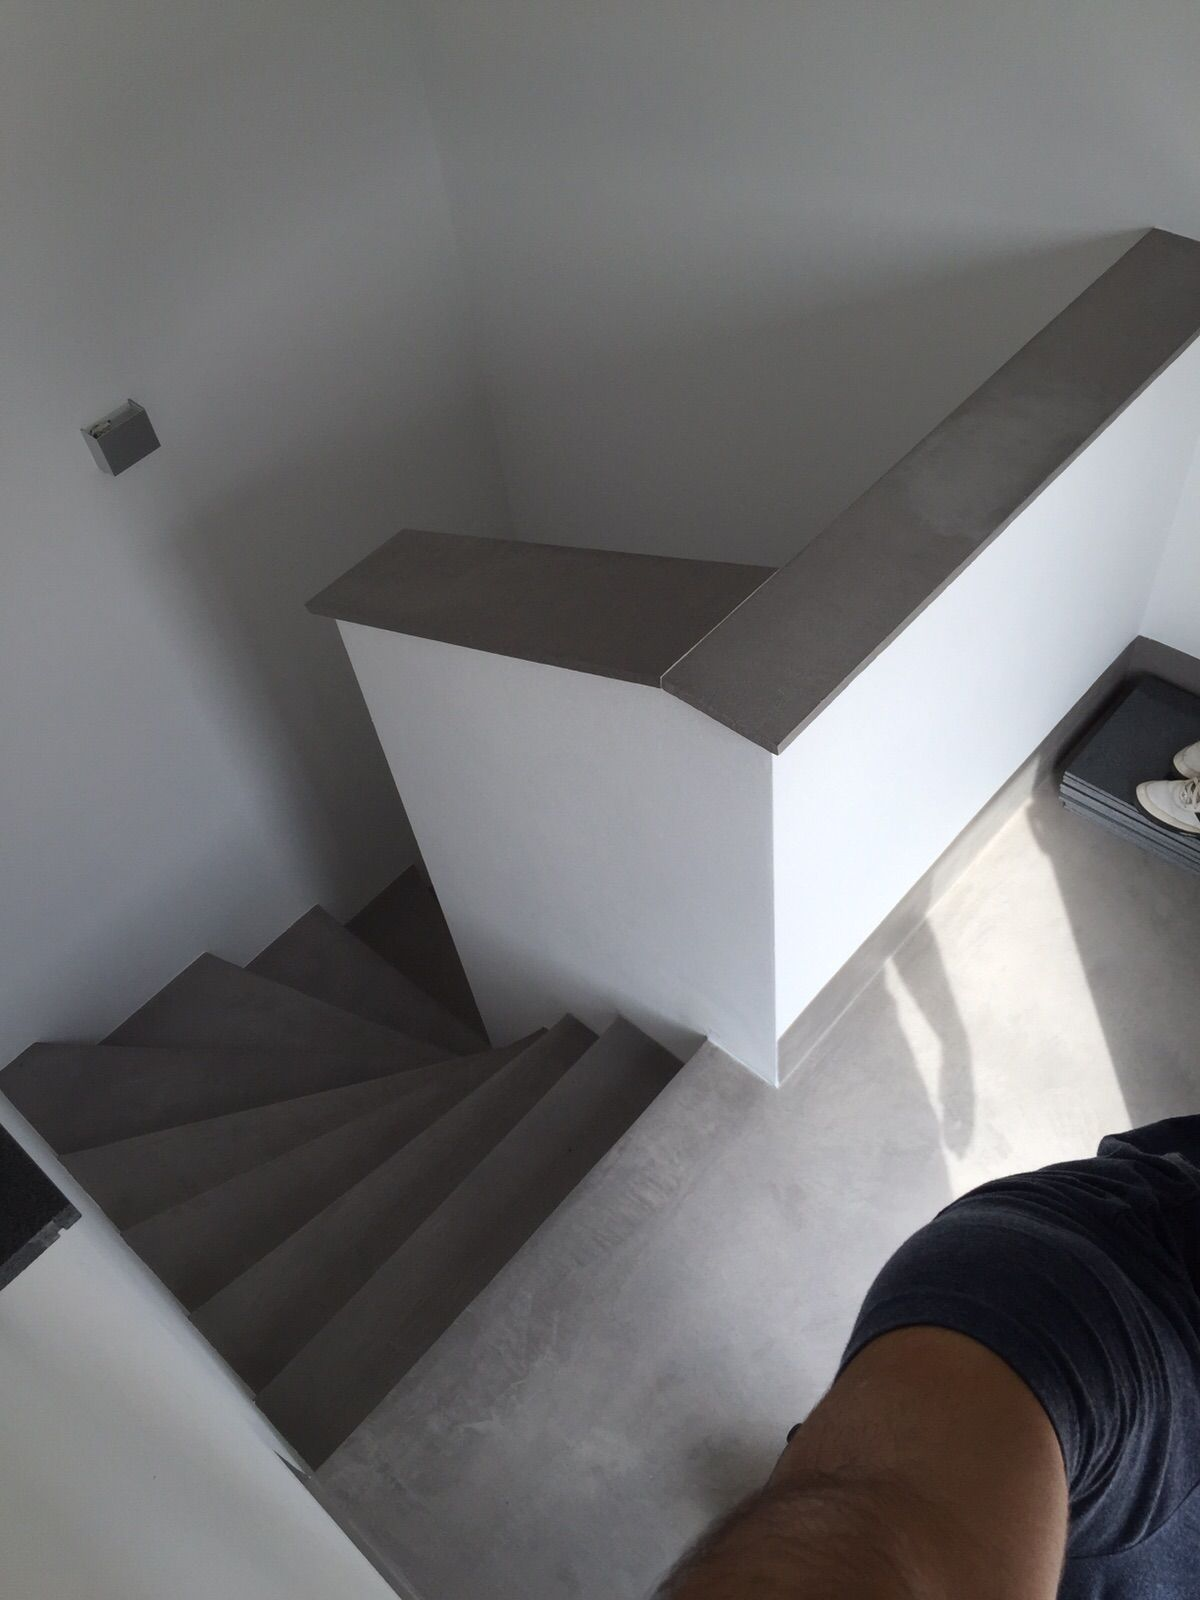 Beton Cire Treppe Fensterbank Fugenlos | Treppe | Pinterest